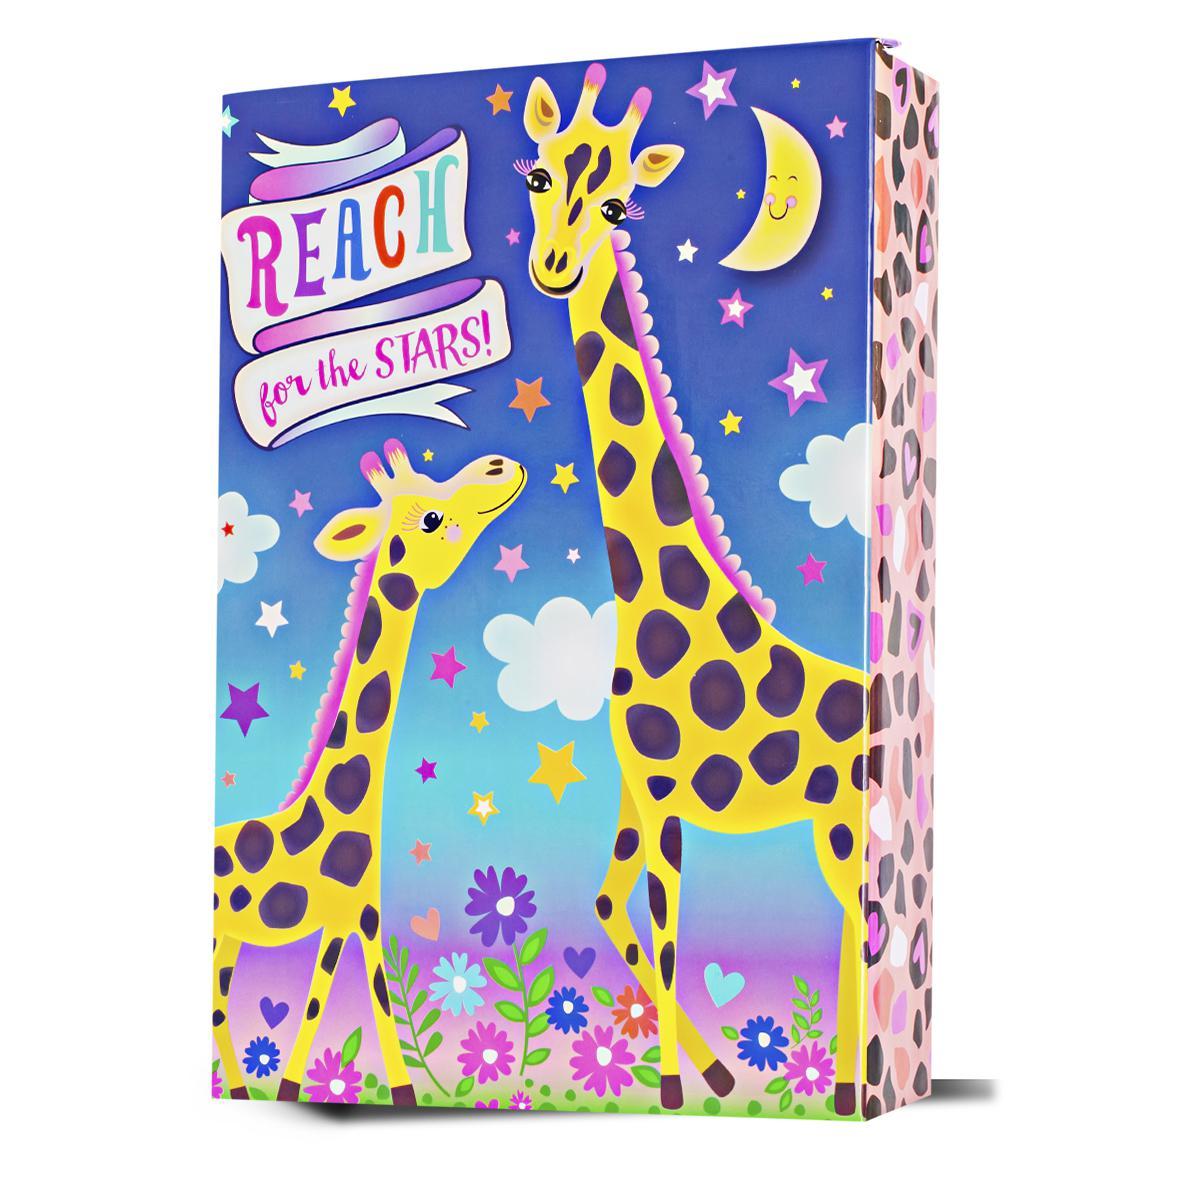 Reach for the Stars! Giraffe Writing Set